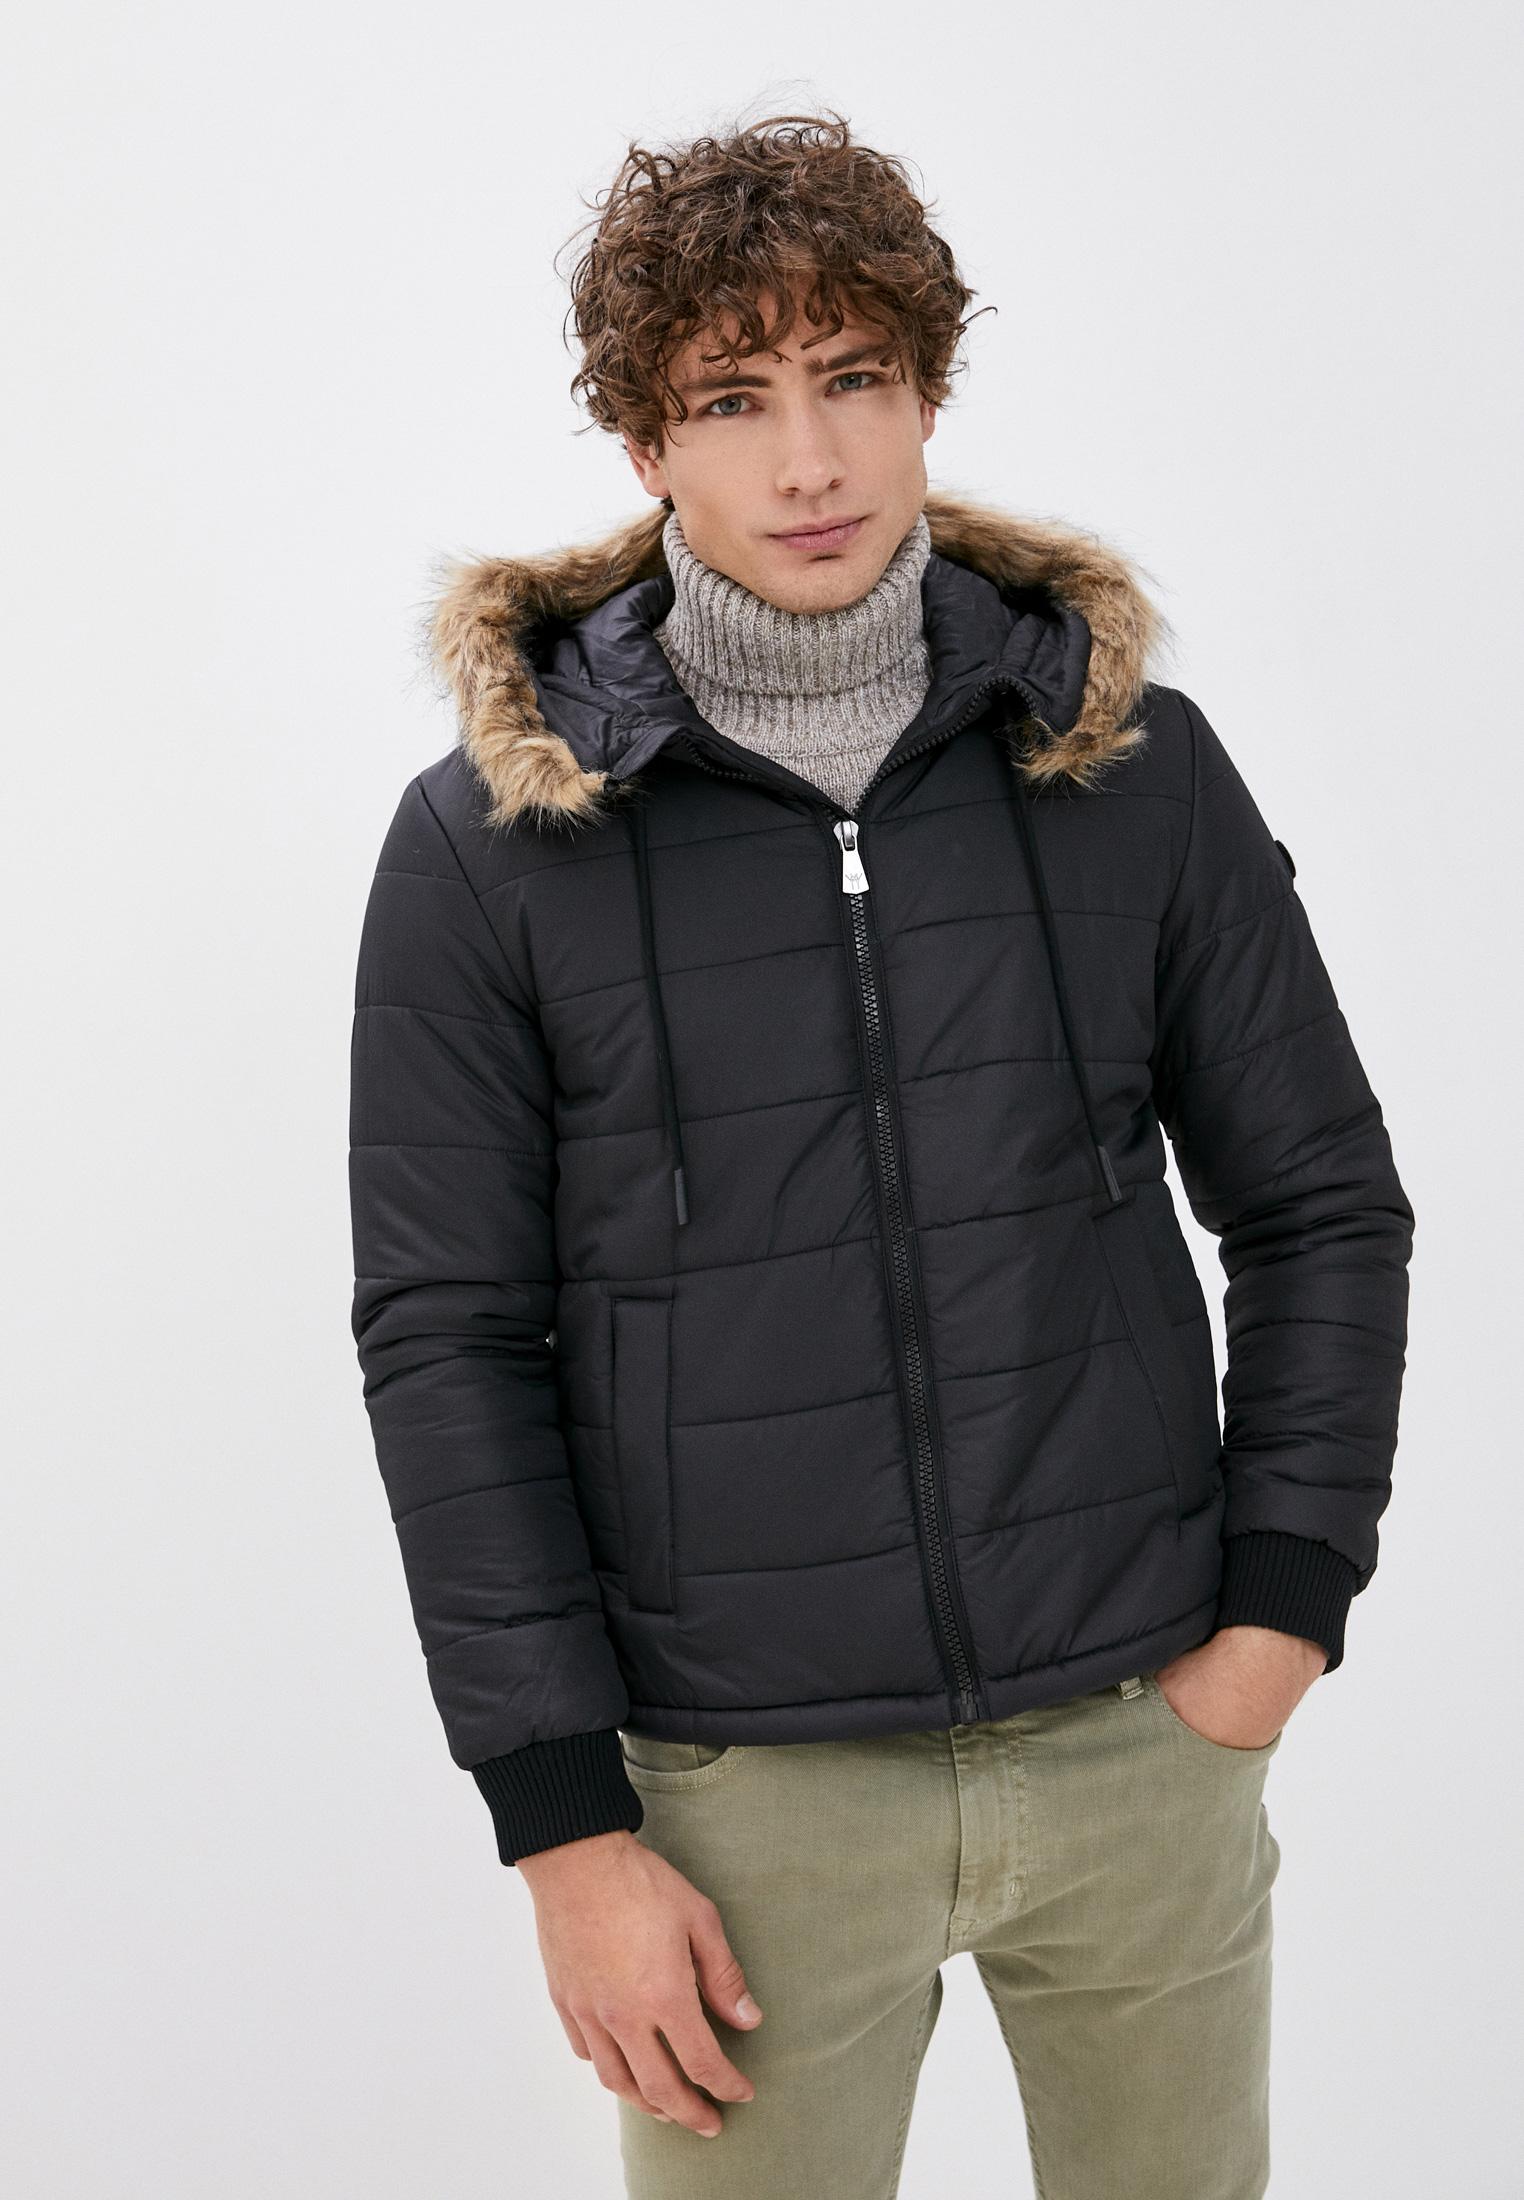 Утепленная куртка Primo Emporio Куртка утепленная Primo Emporio